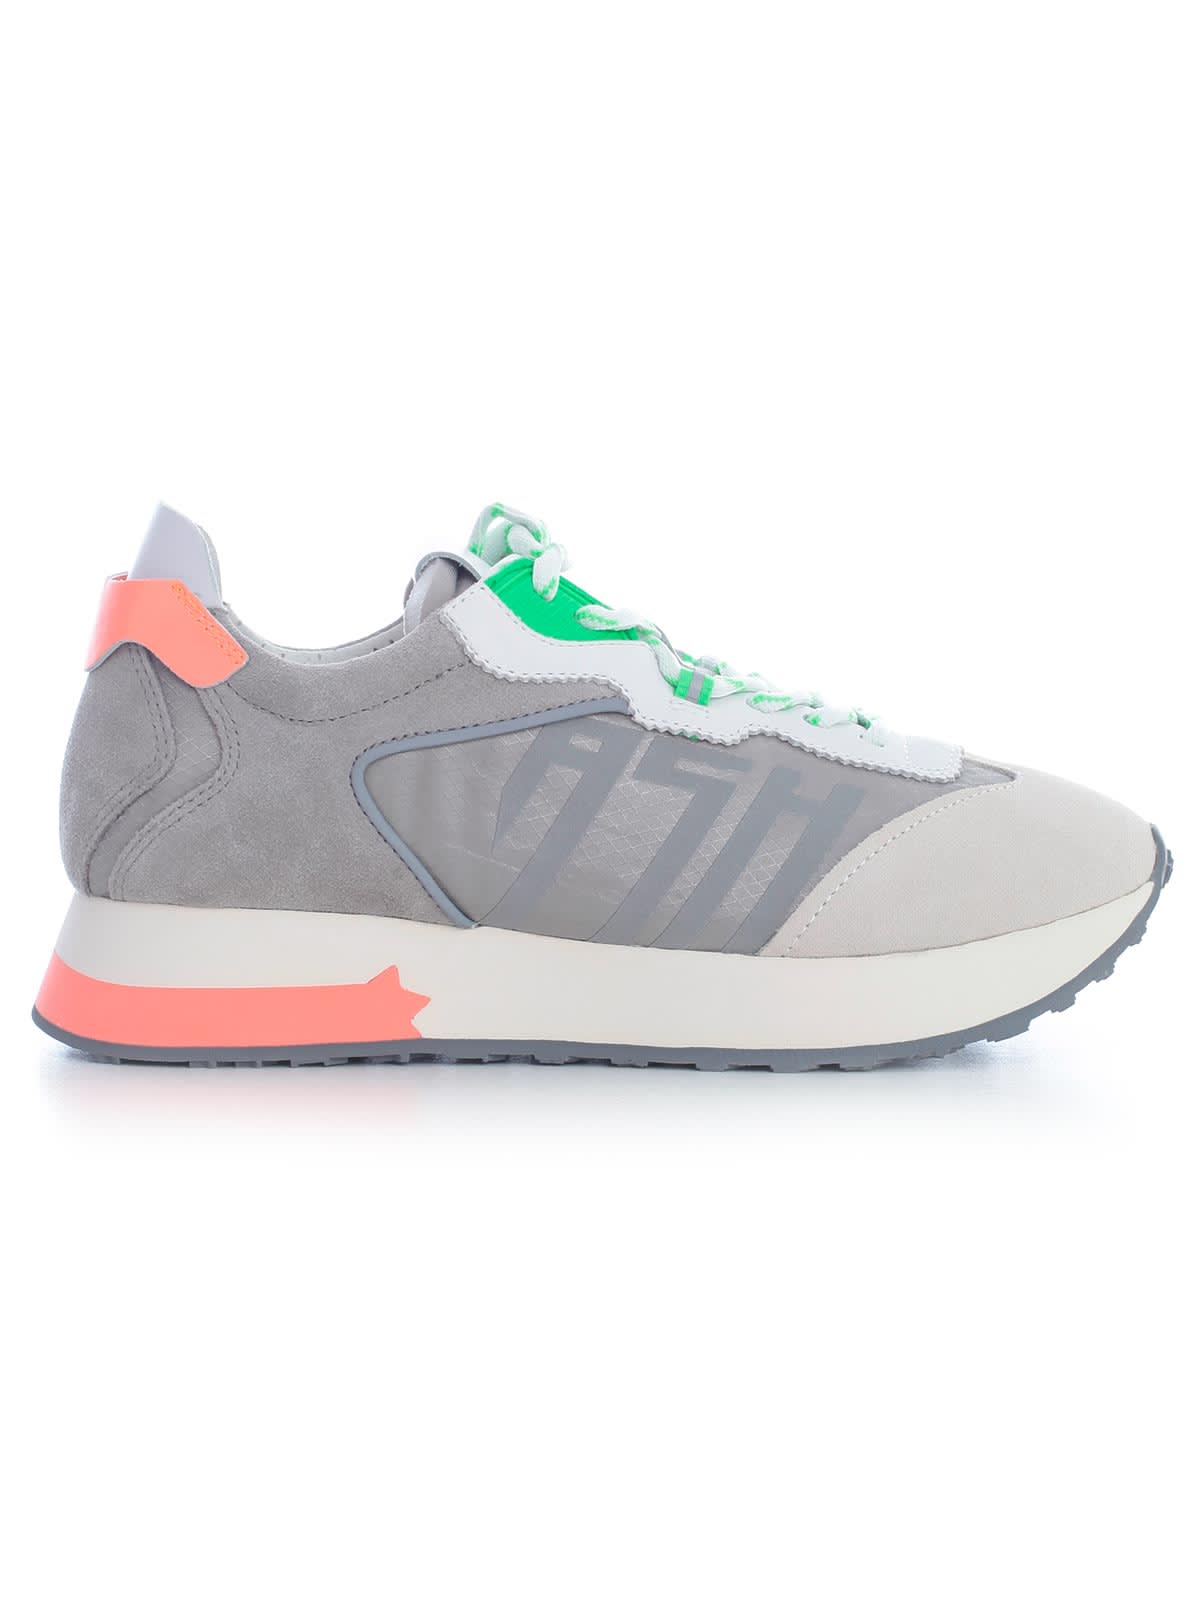 Ash Sneakers W/green Details